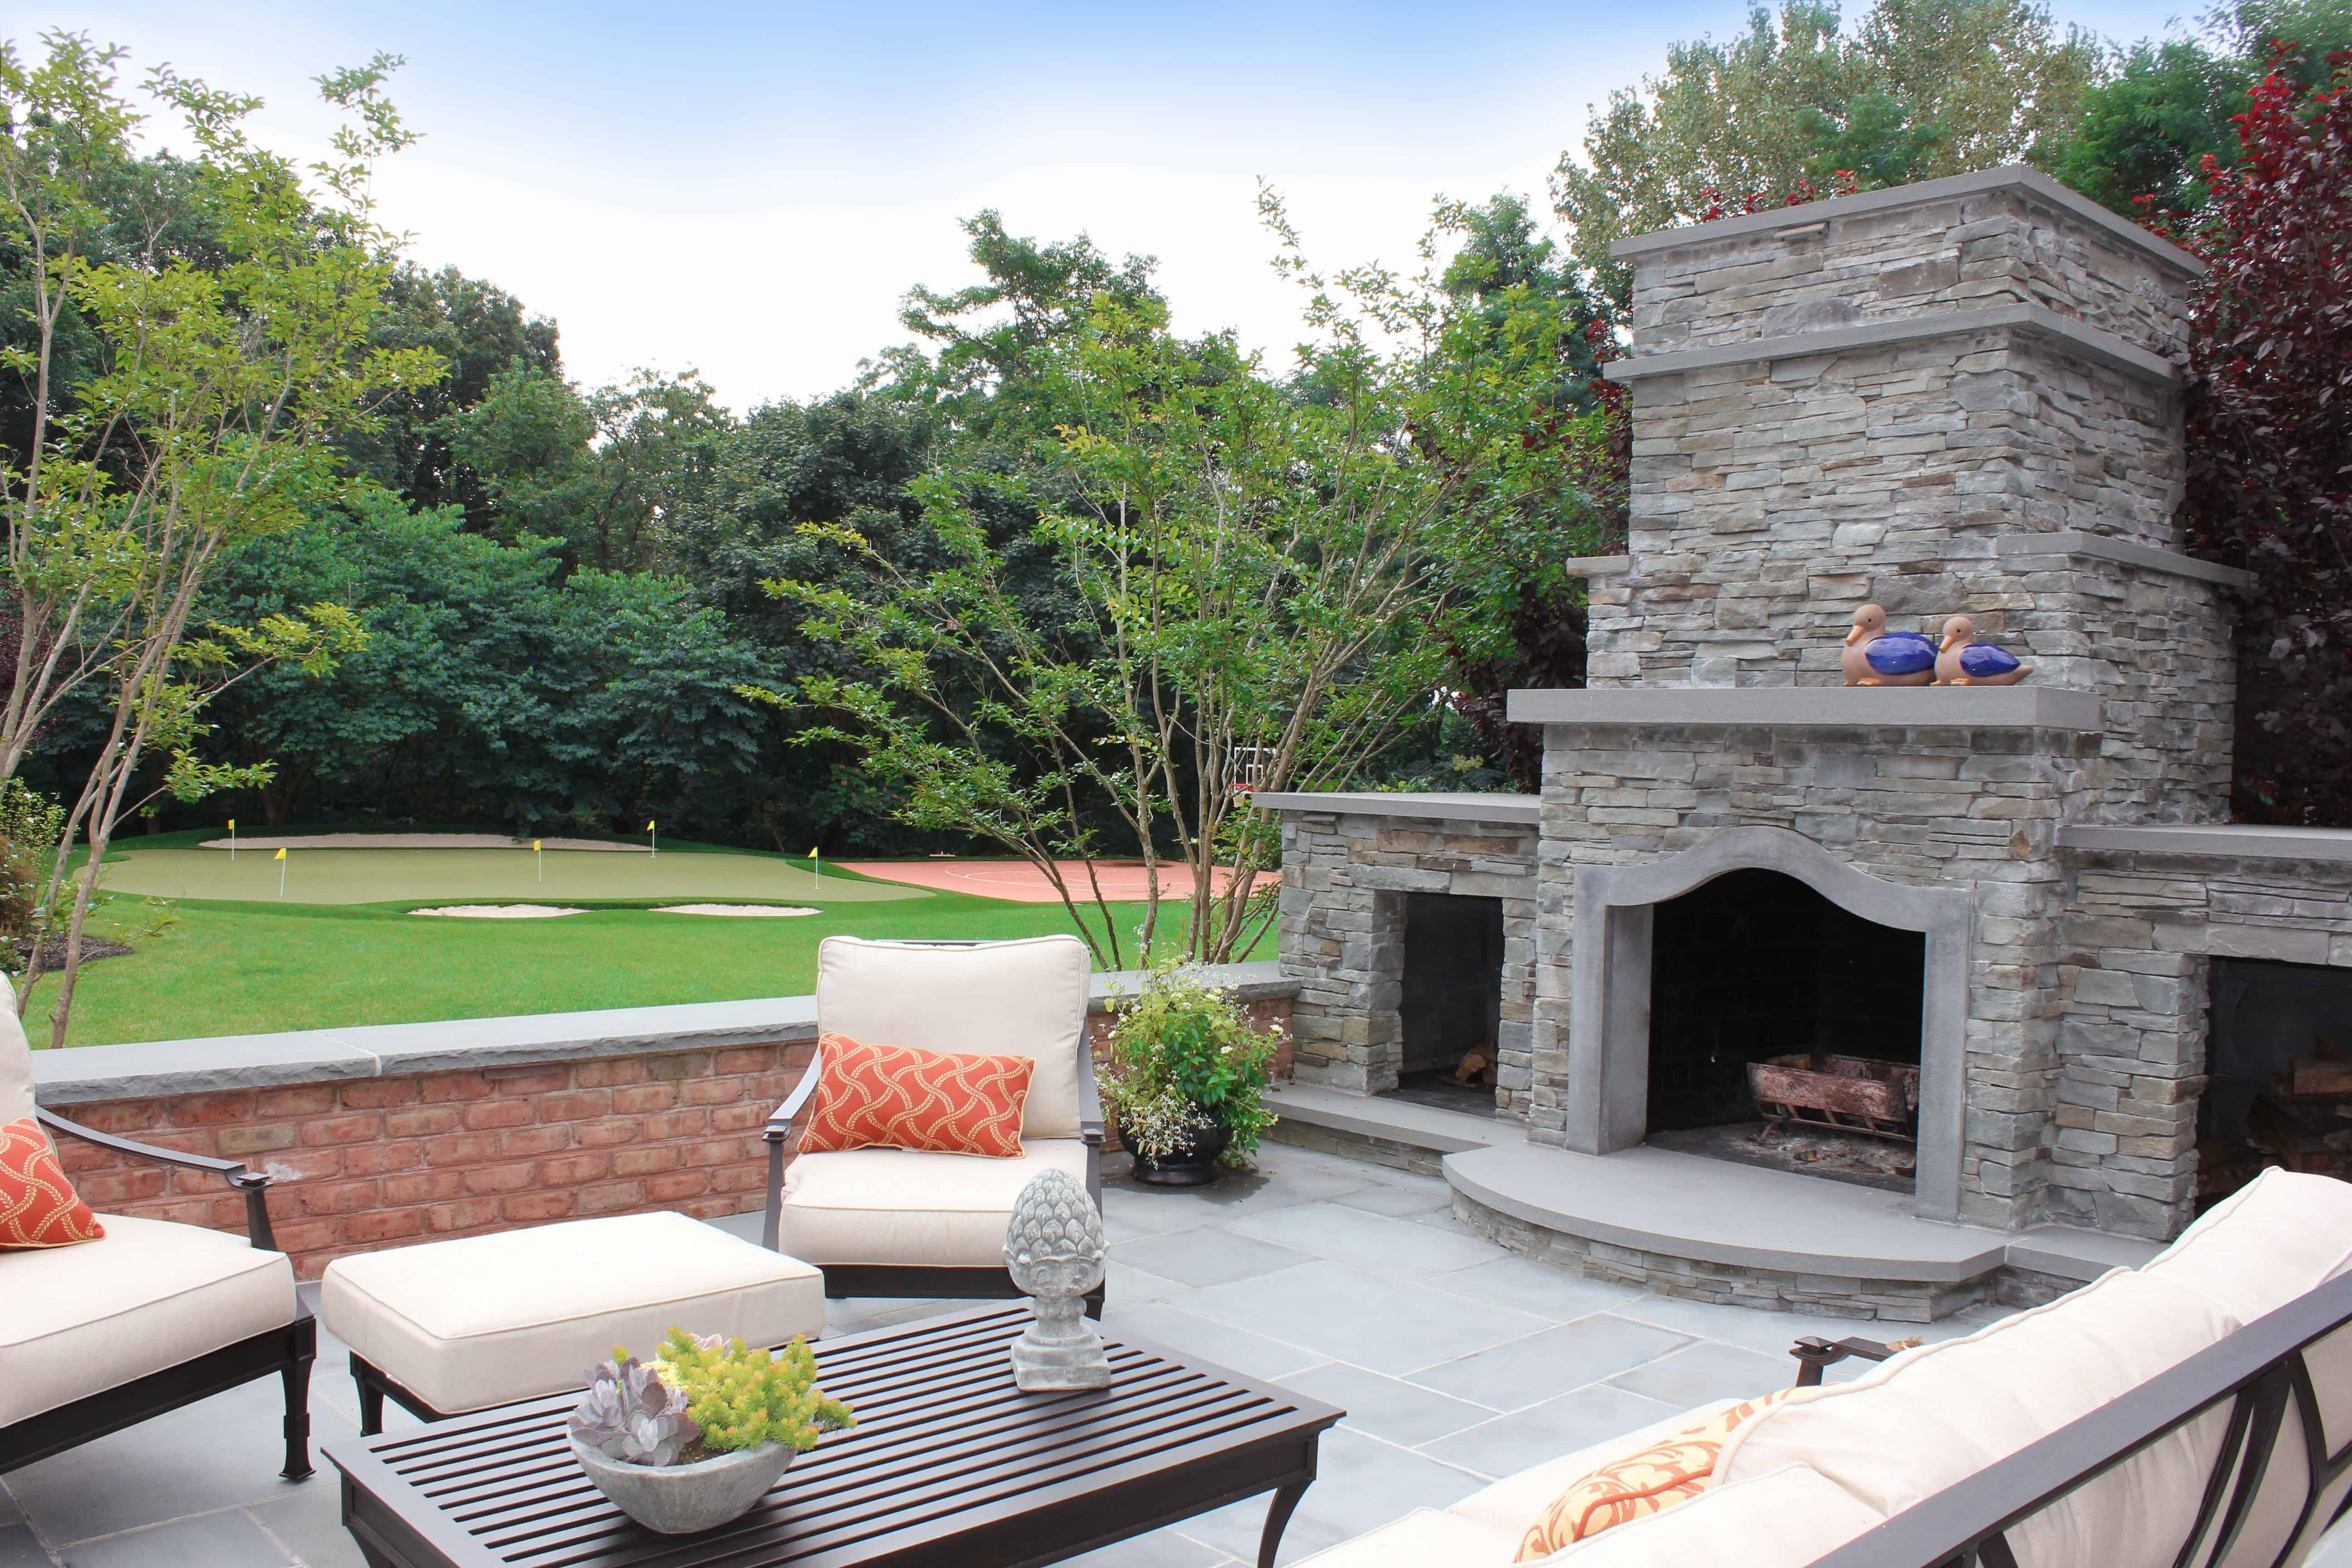 Stacked Bluestone Fireplace with Bluestone accents - Old Westbury, Long Island NY